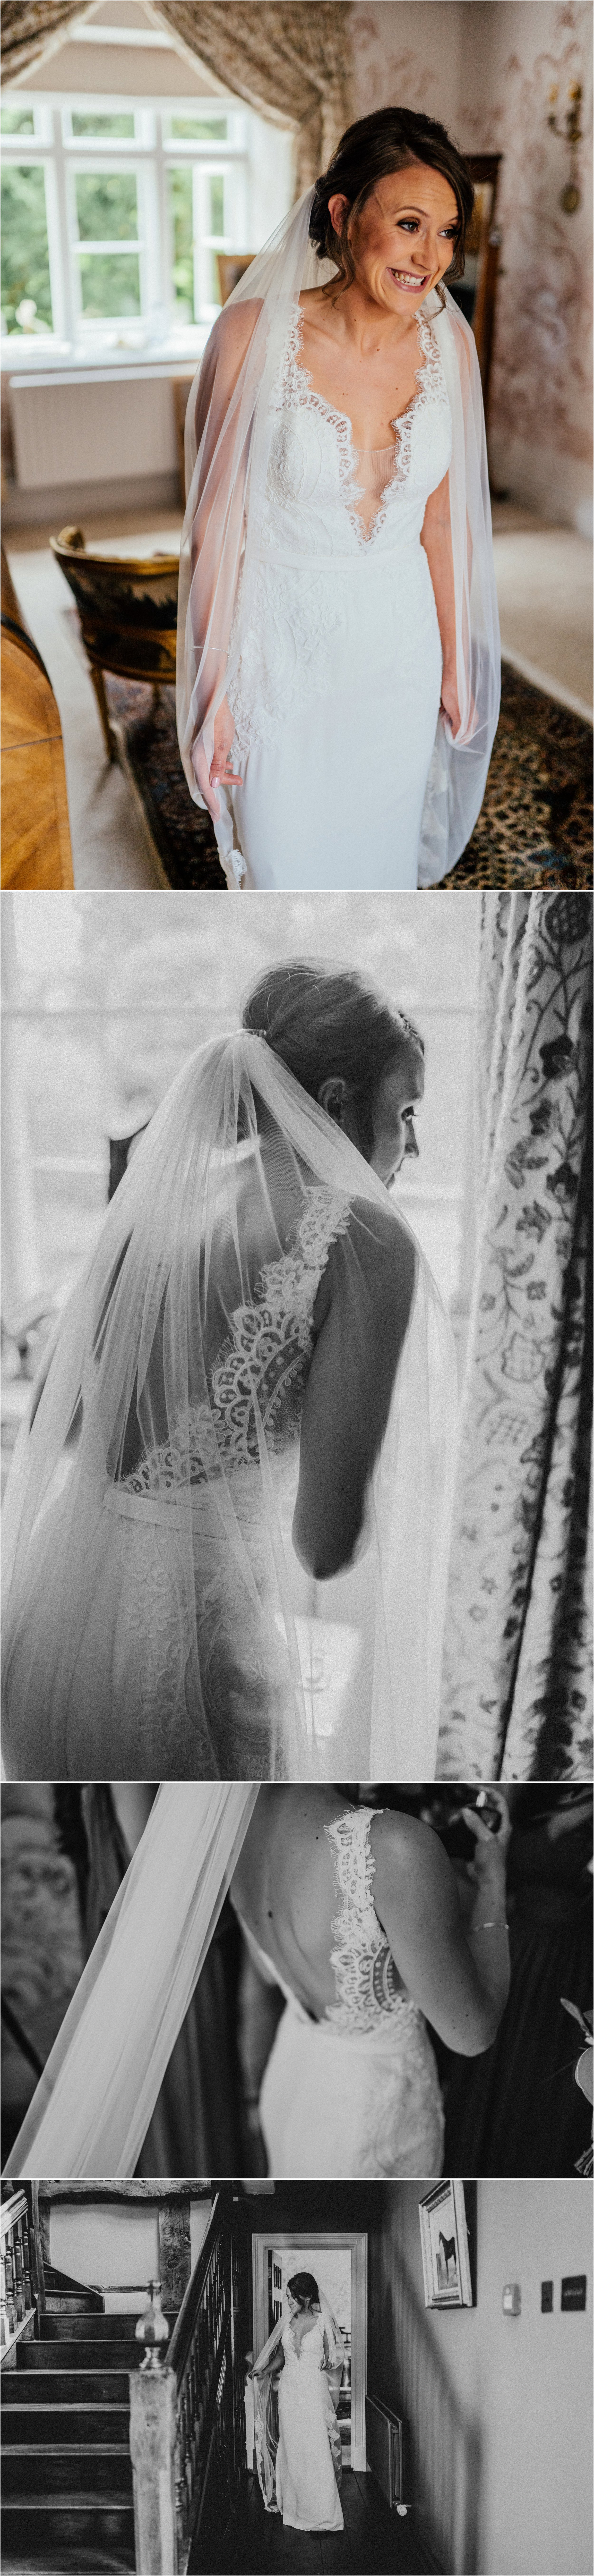 Dewsall Court Herefordshire wedding photographer_0027.jpg